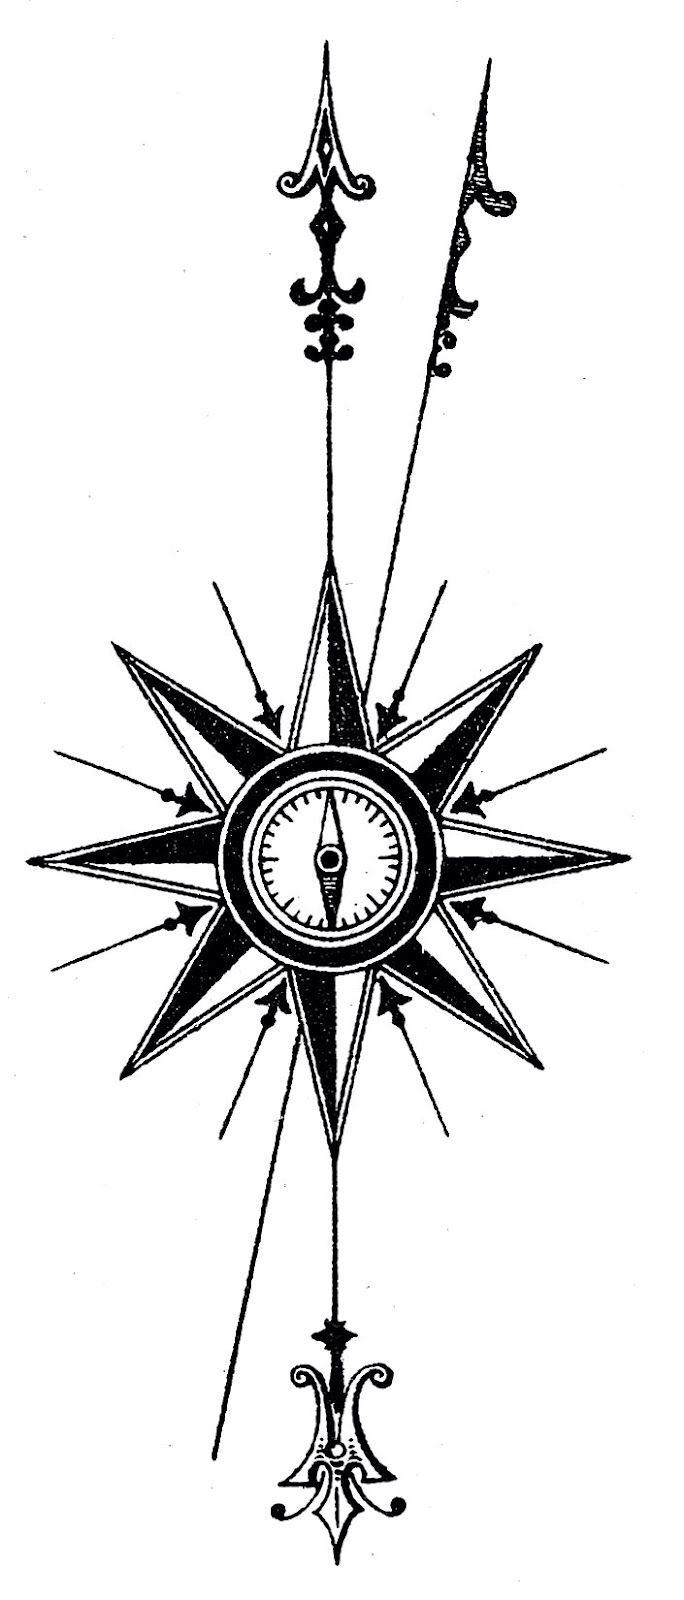 North arrow ink pinterest arrow and tattoo north arrow biocorpaavc